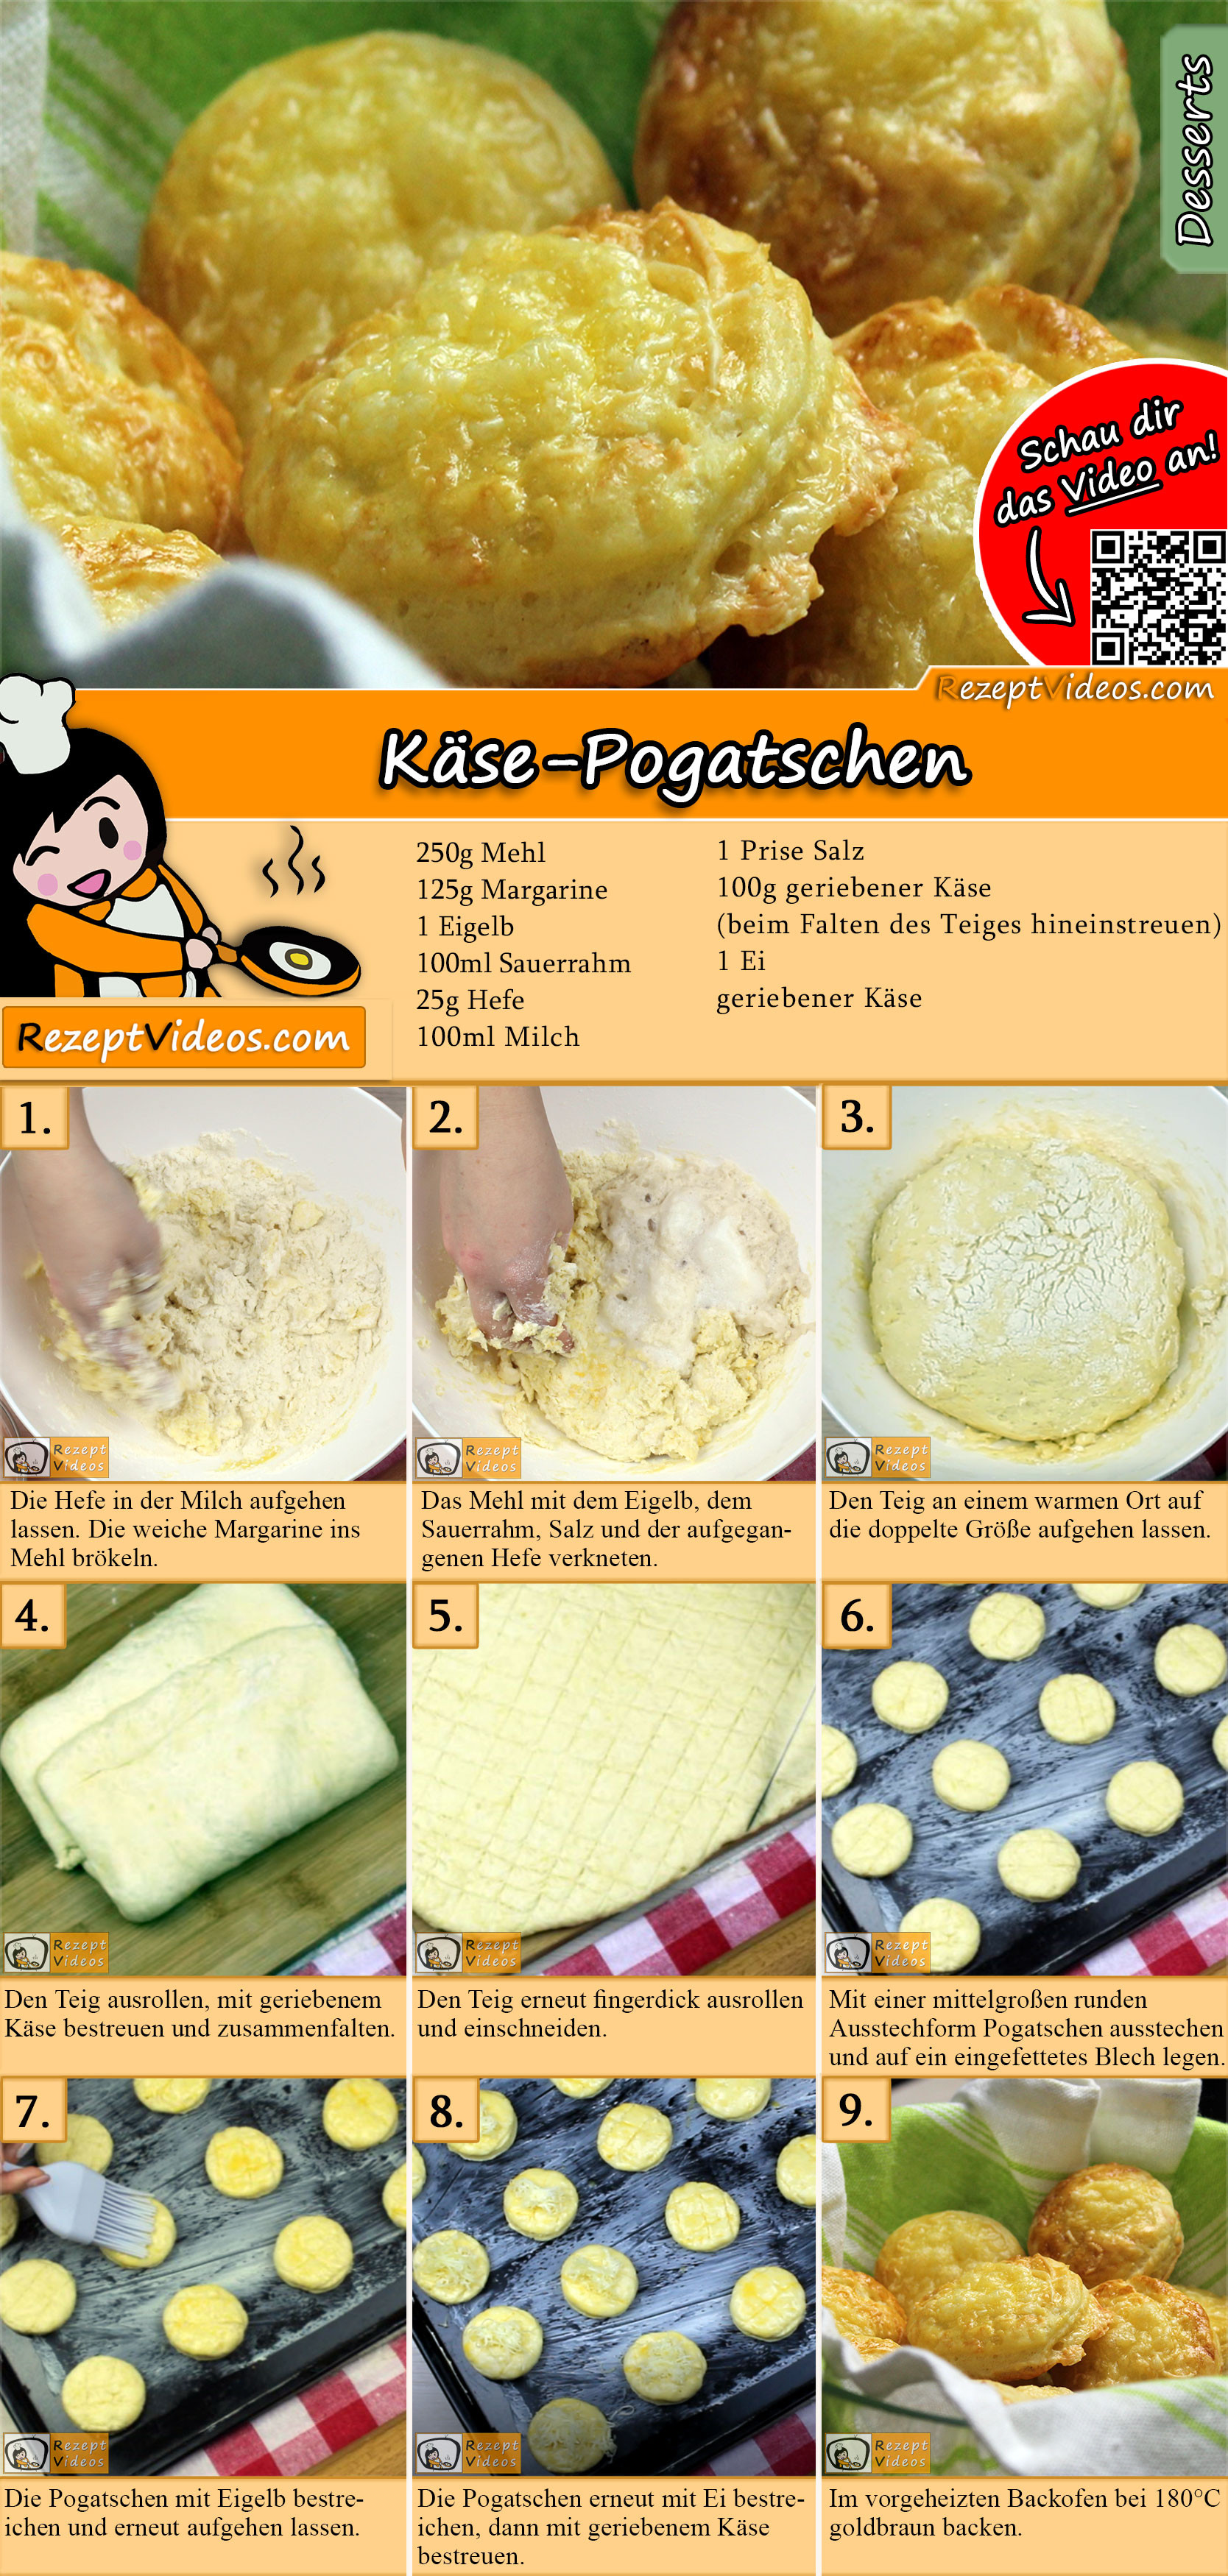 Käse-Pogatschen Rezept mit Video